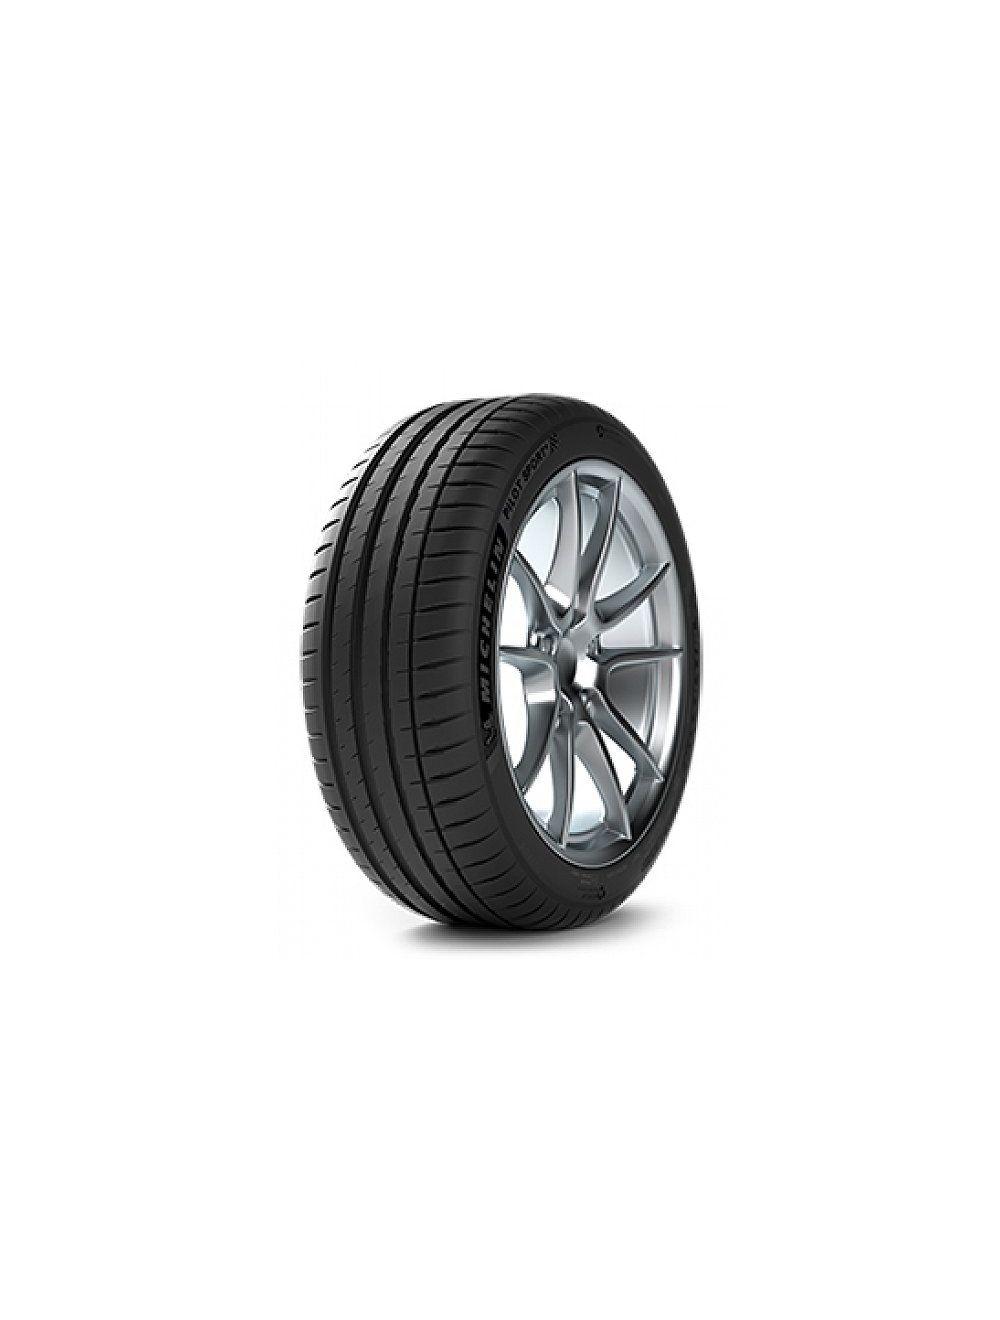 Michelin 265/35R18 Y Pilot Sport 4 XL Nyári gumi